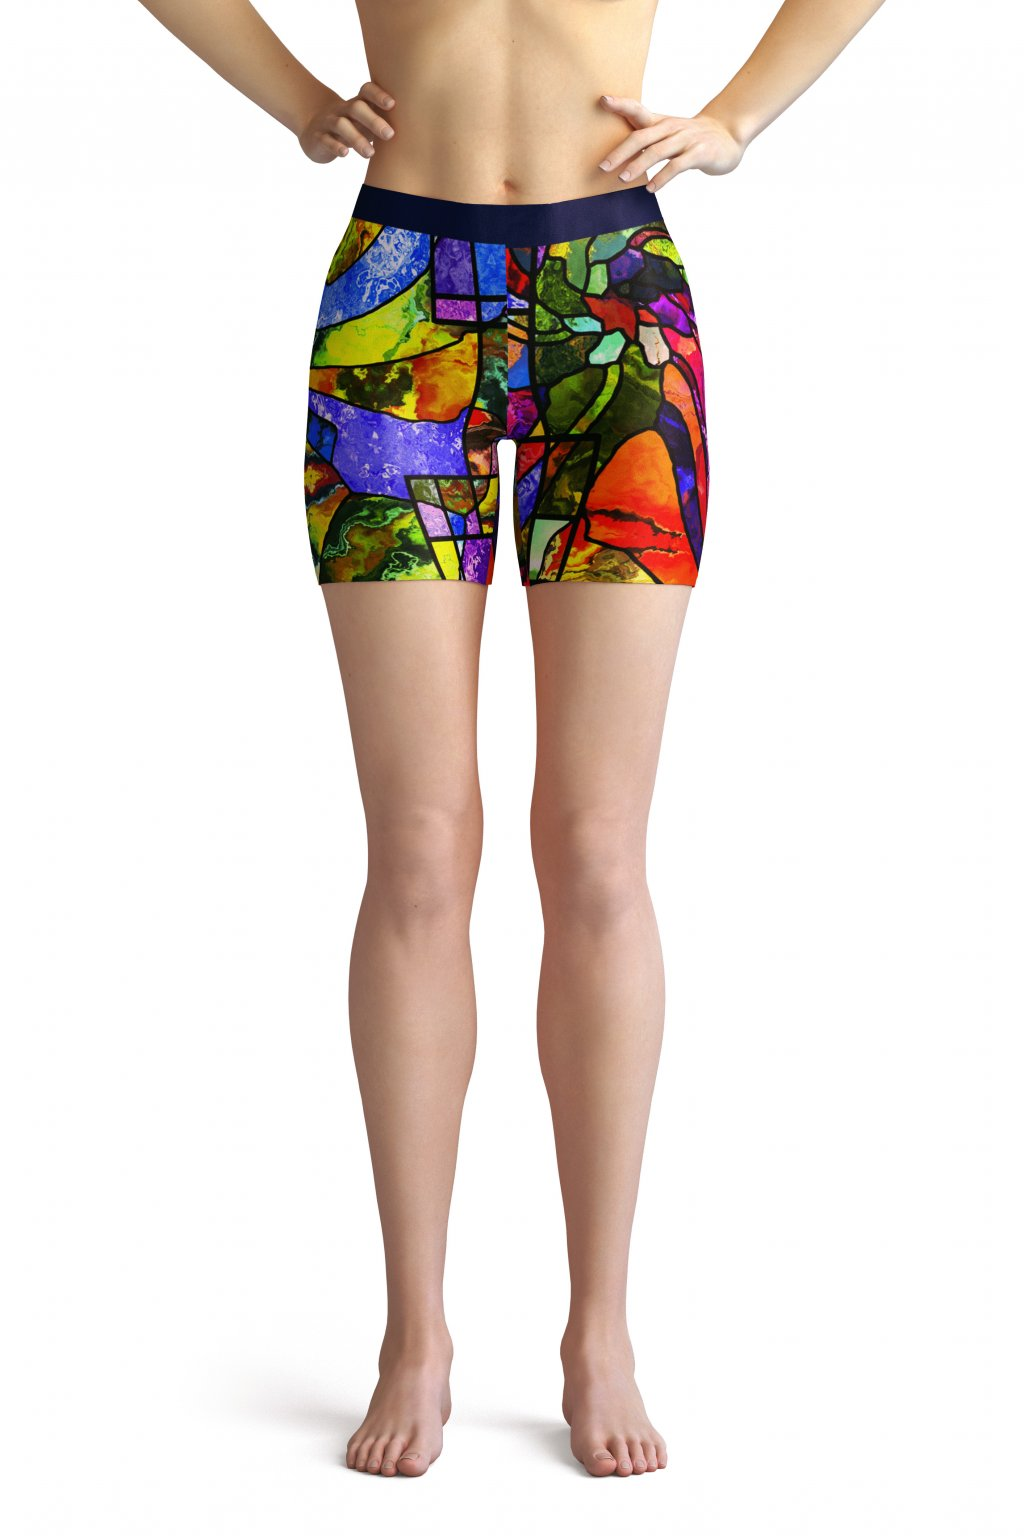 vitrage shorts front by utopy